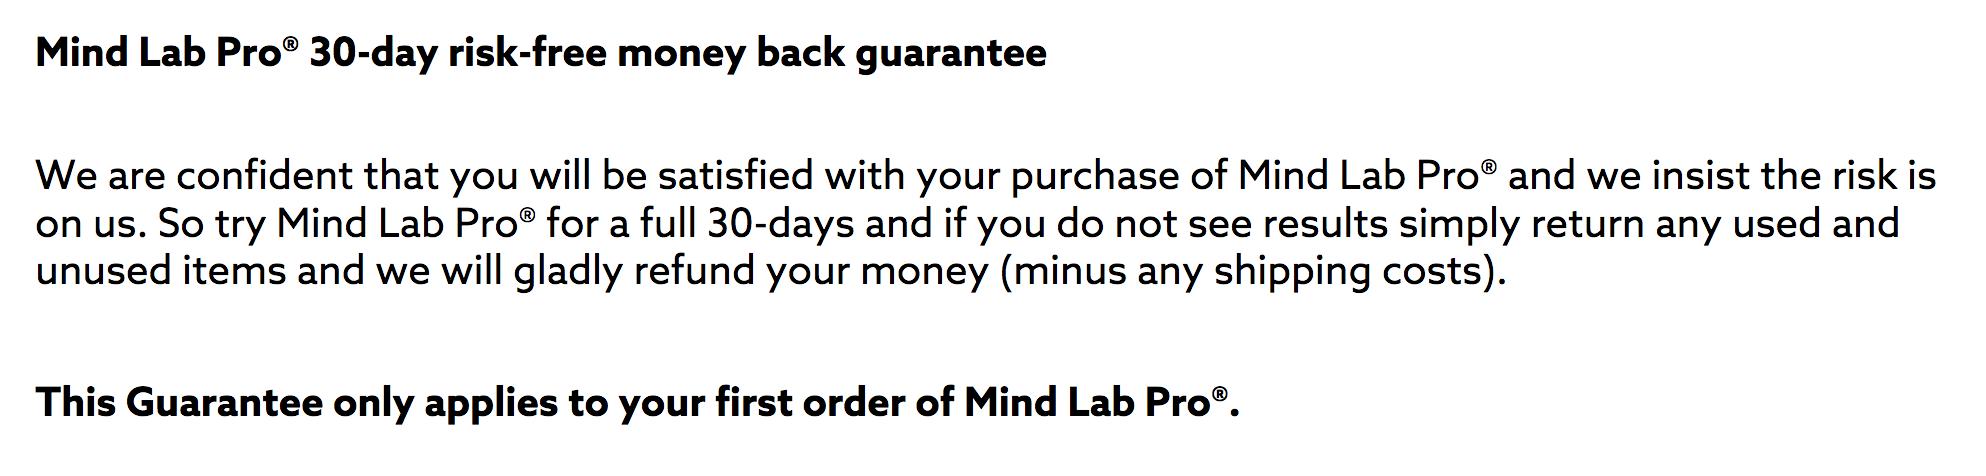 MindLab Pro 3-Month Supply, MindLab Pro Review, MindLab Pro, MindLab Pro Scam, Mindab Pro Return